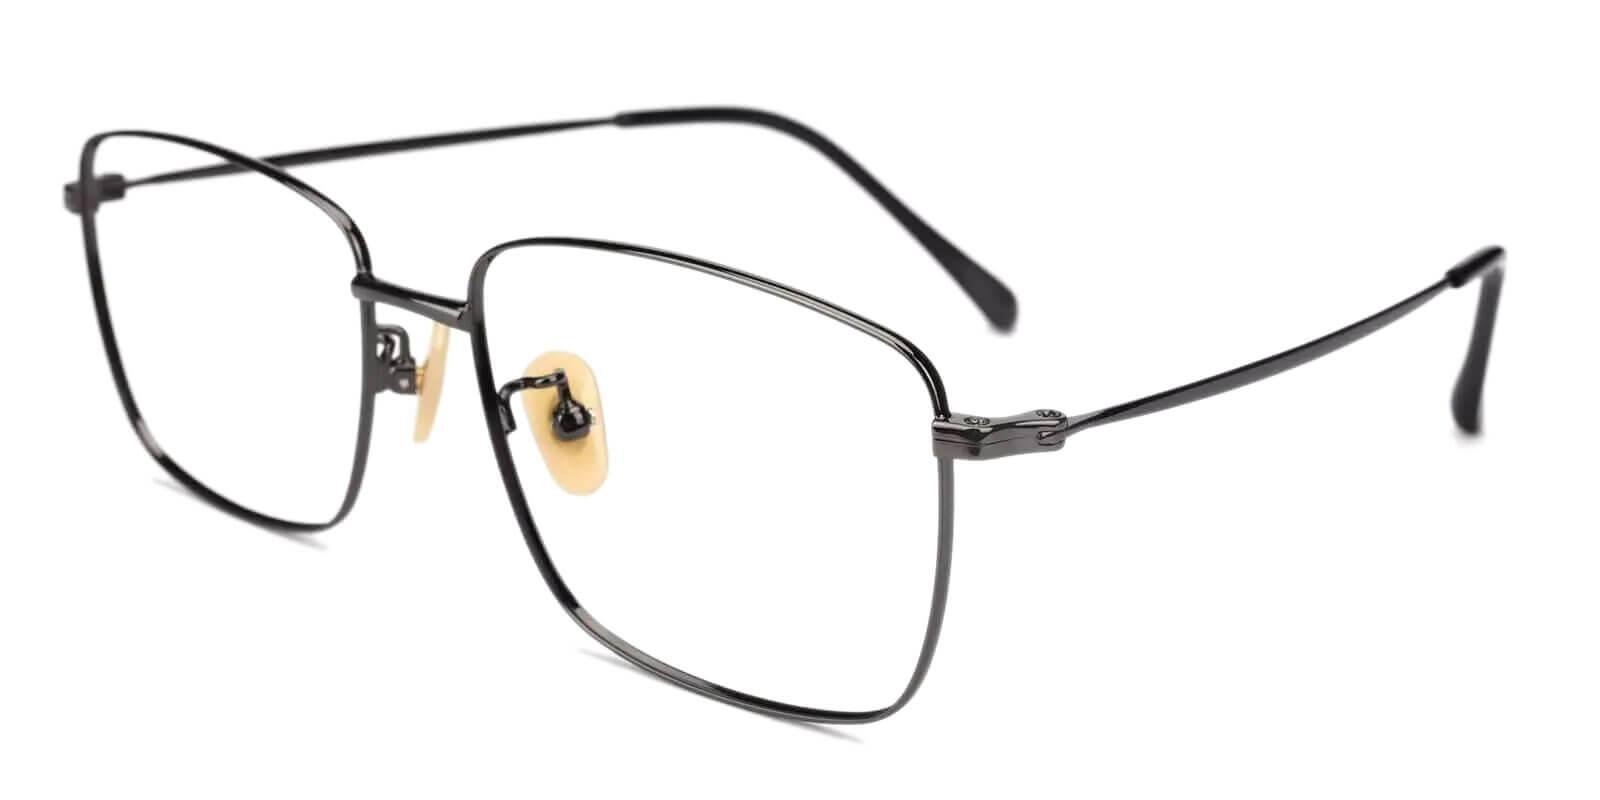 Morocco Gun Titanium Eyeglasses , Lightweight , NosePads Frames from ABBE Glasses